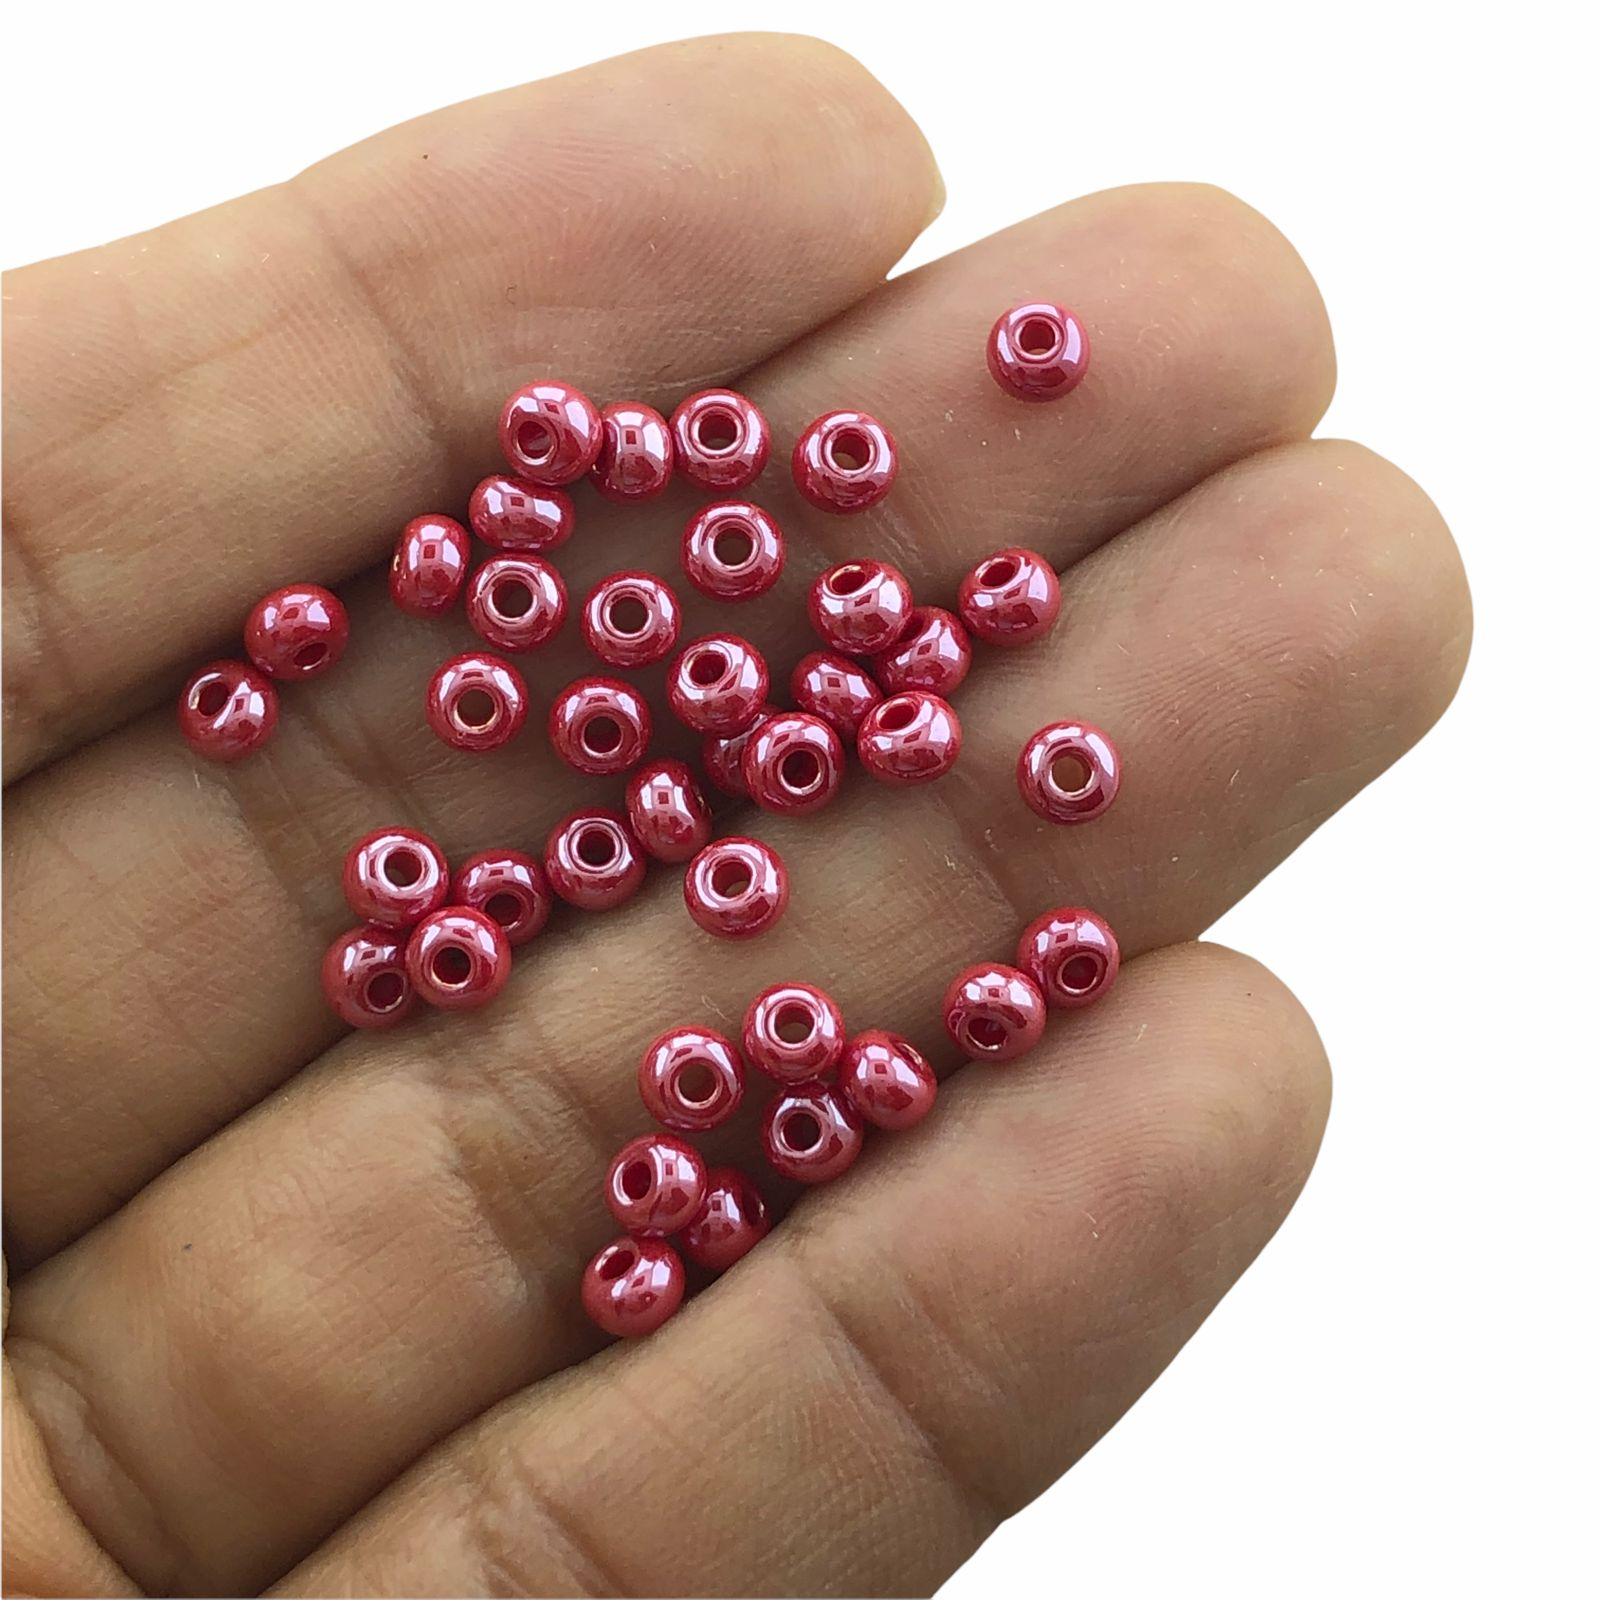 MIC261 - Miçanga Jablonex nº6 Vermelho Perolado 4,1mm - 20Grs